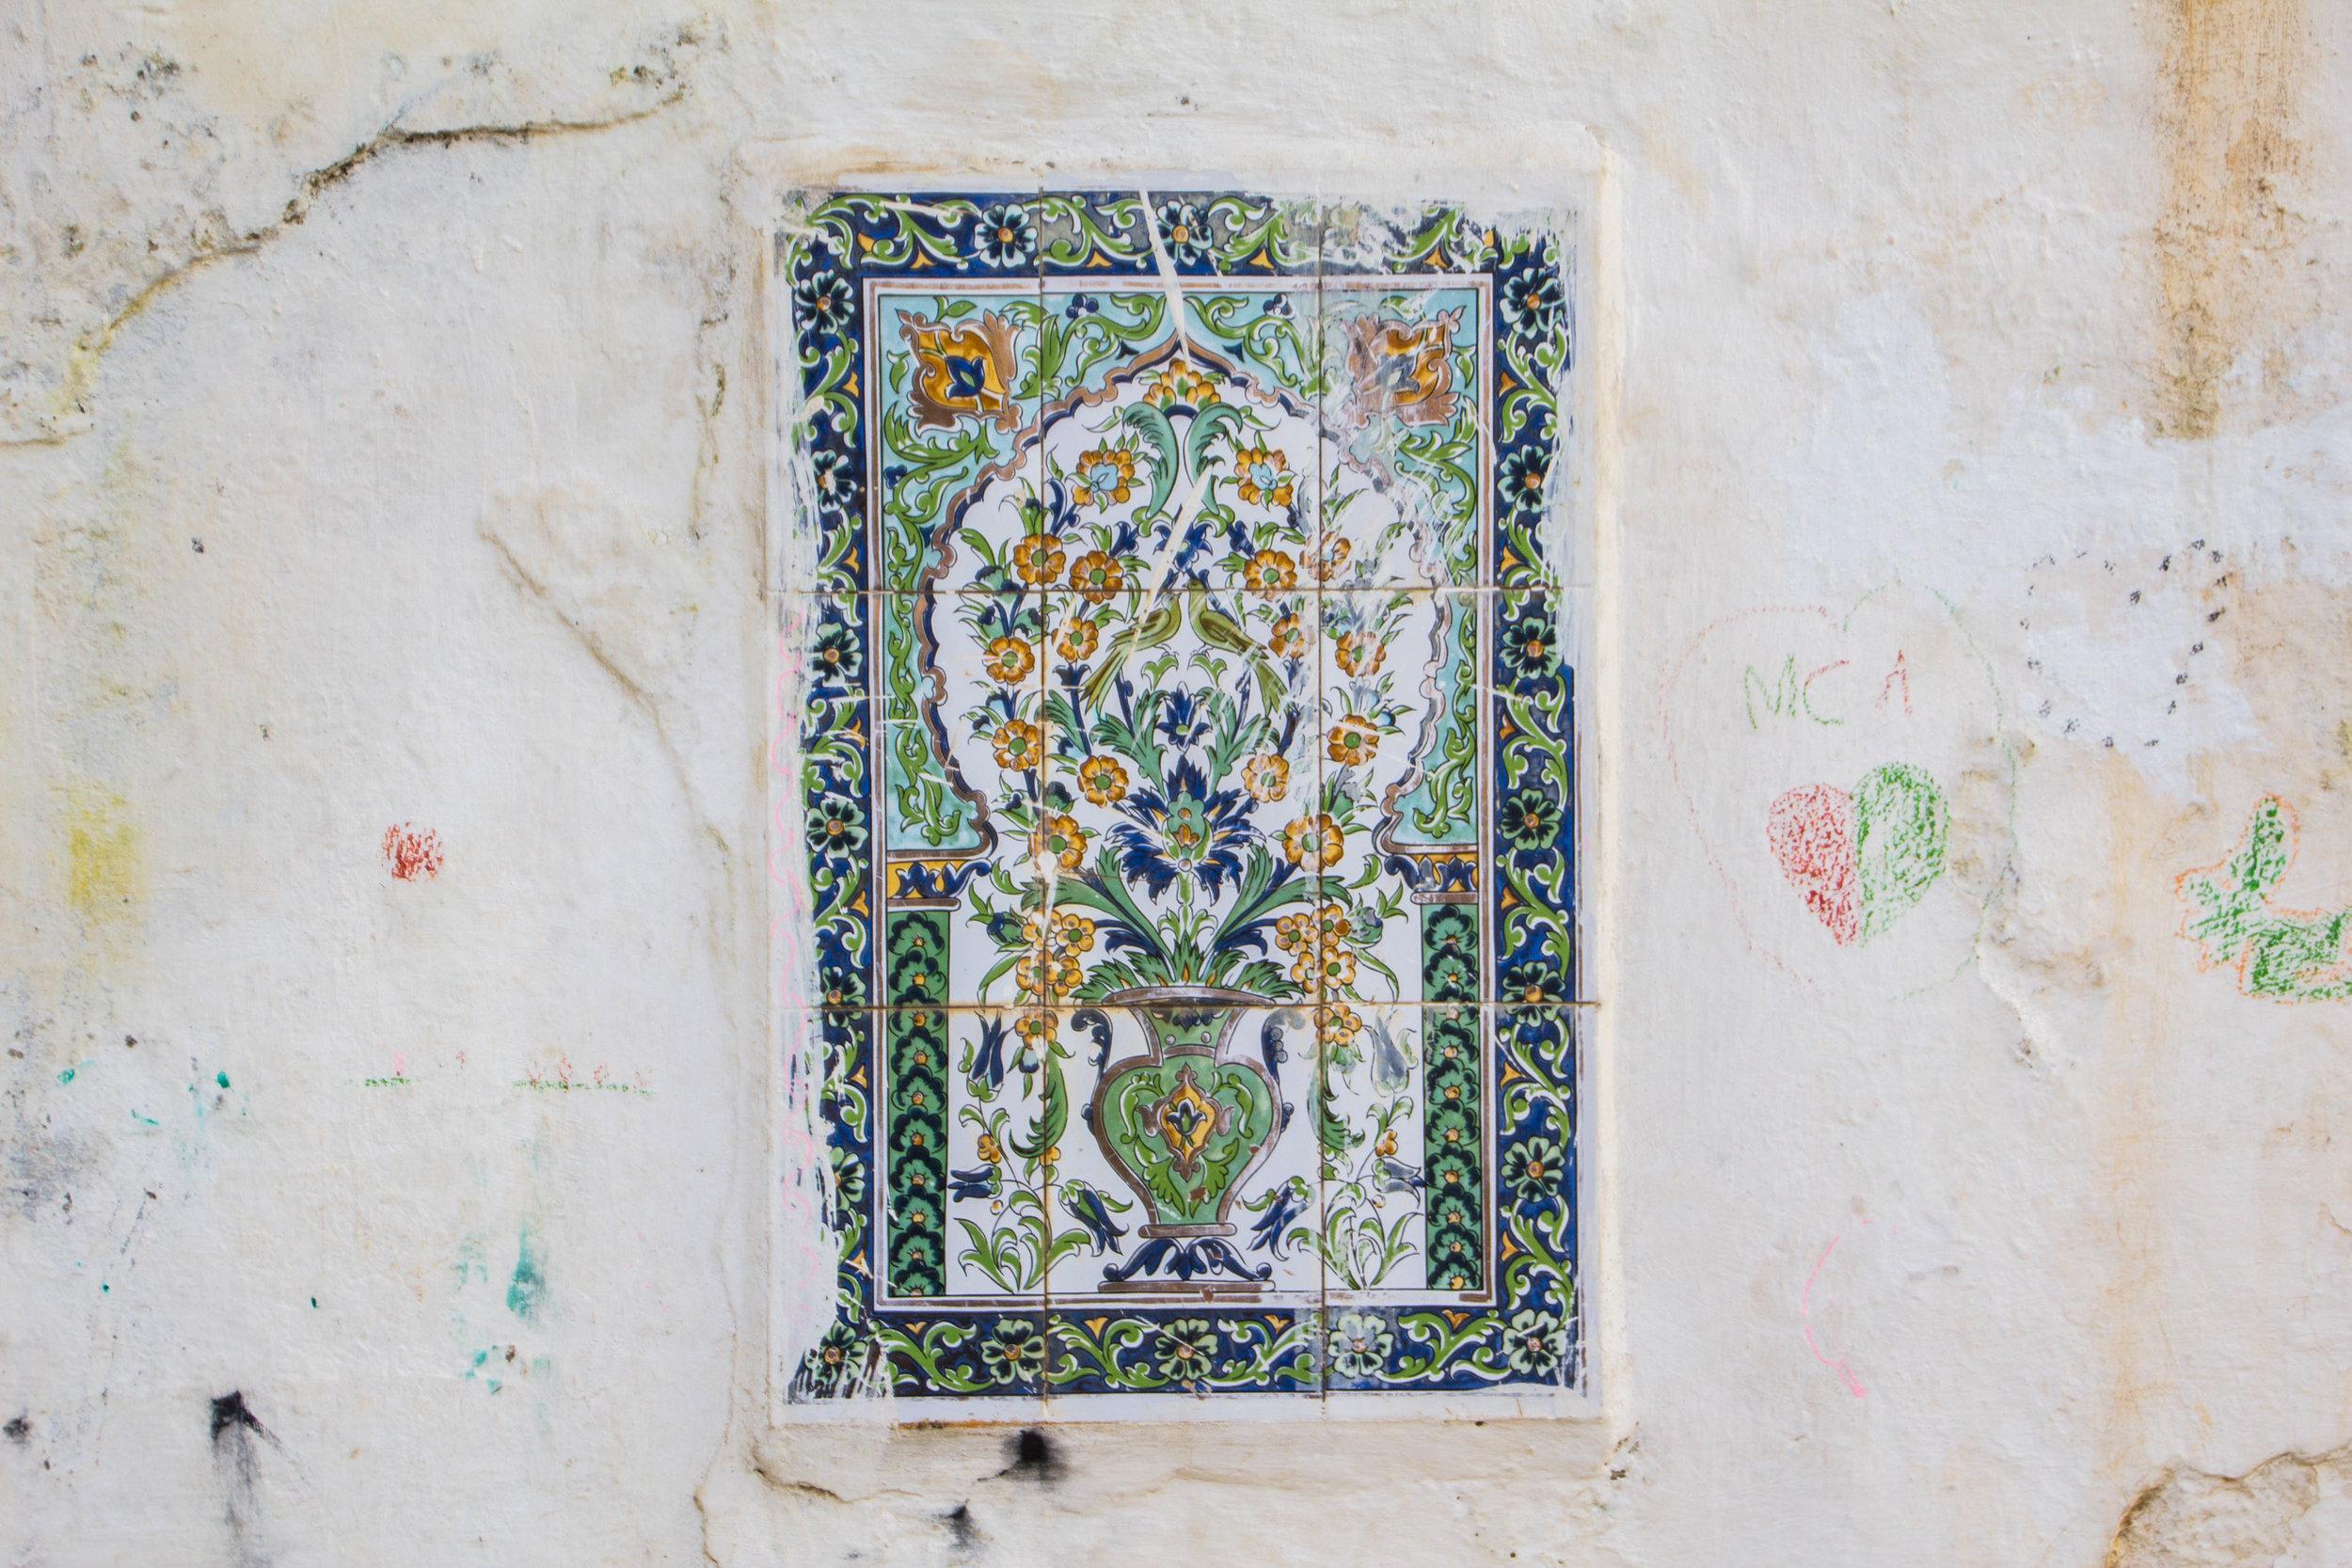 casbah-photography-algiers-algeria-alger-38.jpg